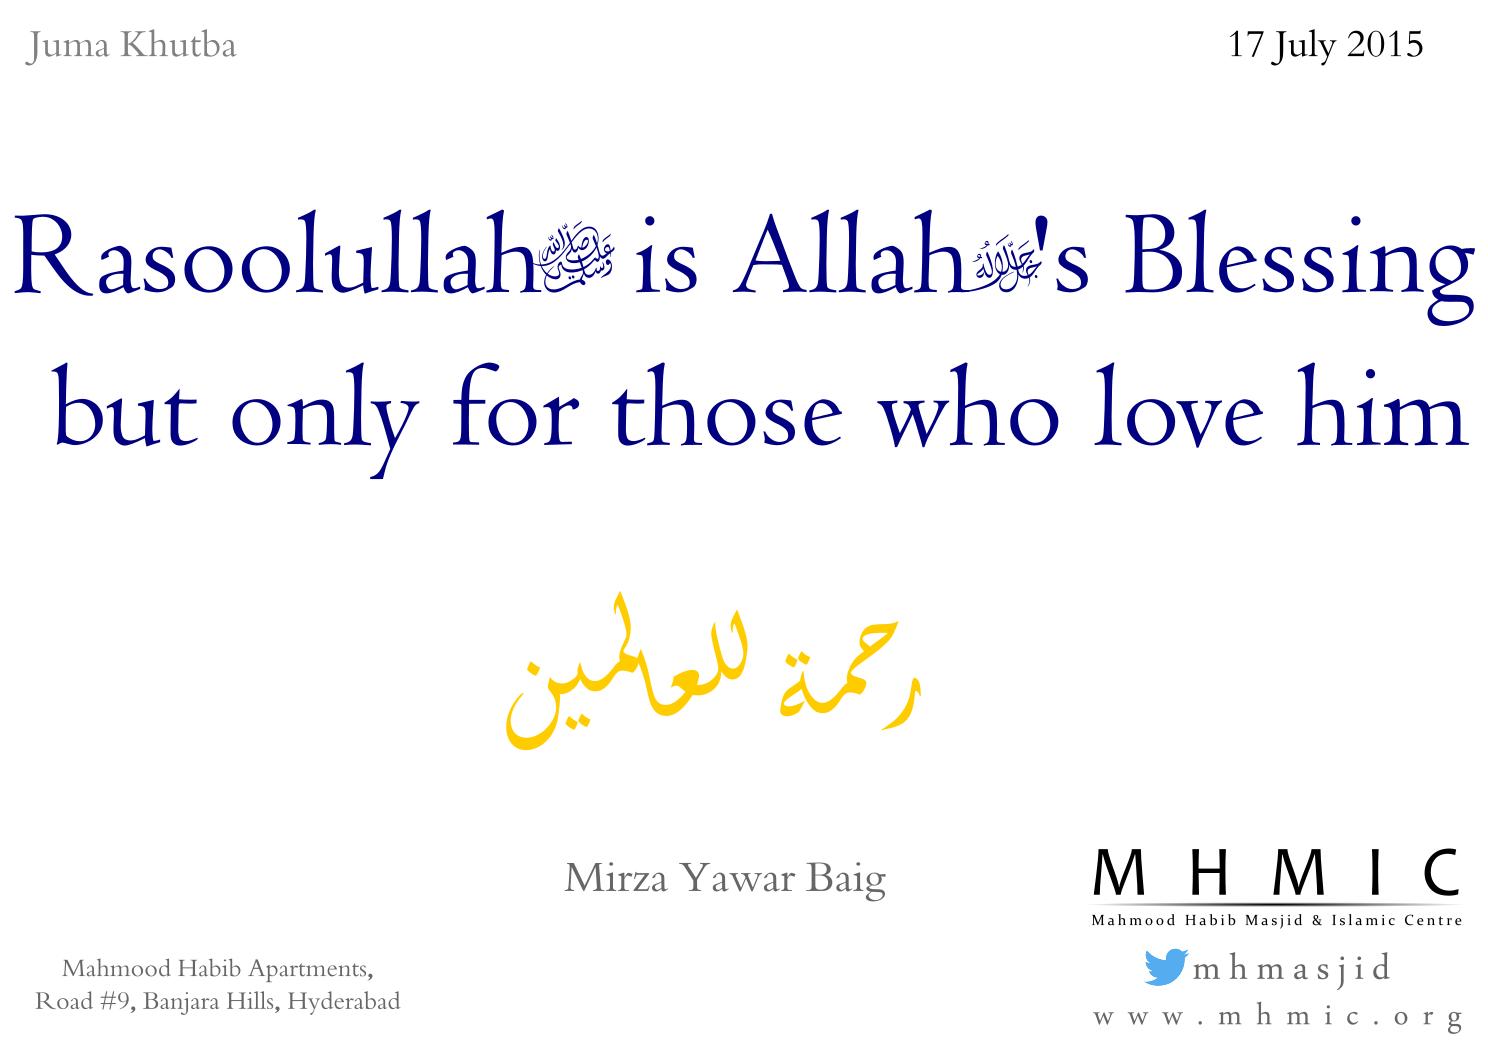 Rasoolullah is Allahs blessing Part 1 Mirza Yawar Baig